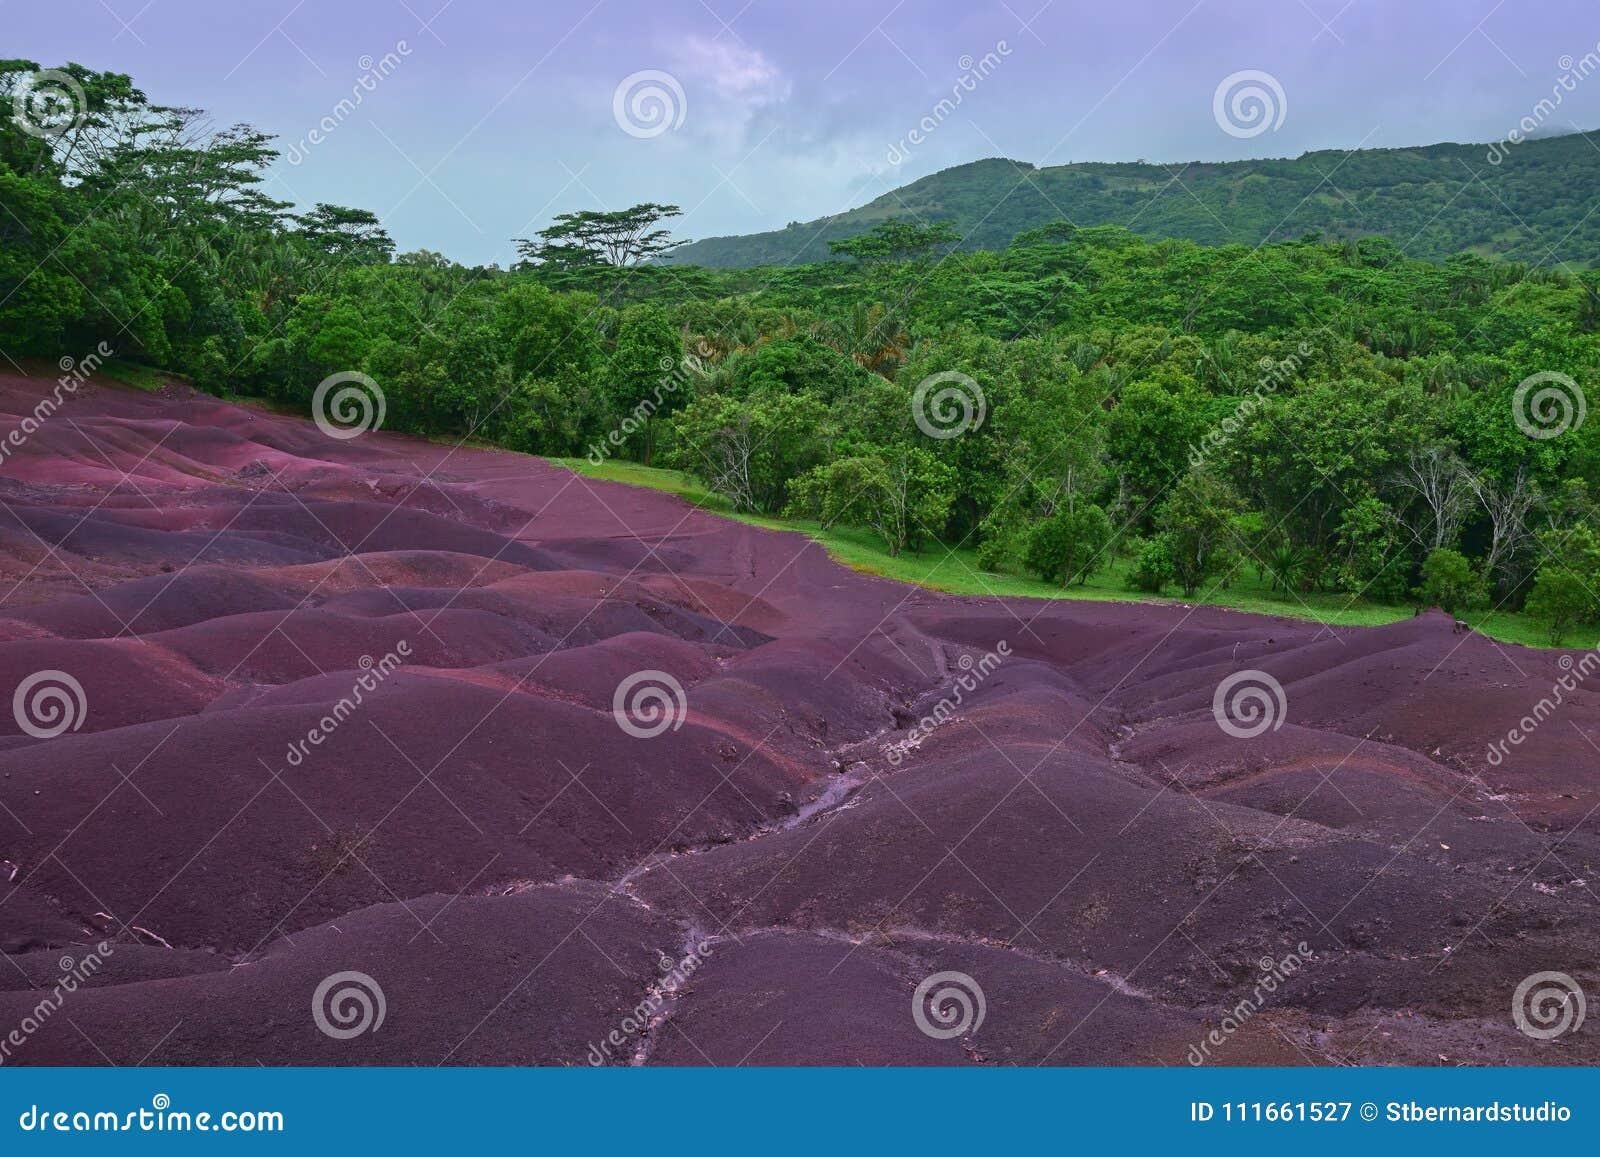 Scenic Natural Wonder of Chamarel plain at Mauritius